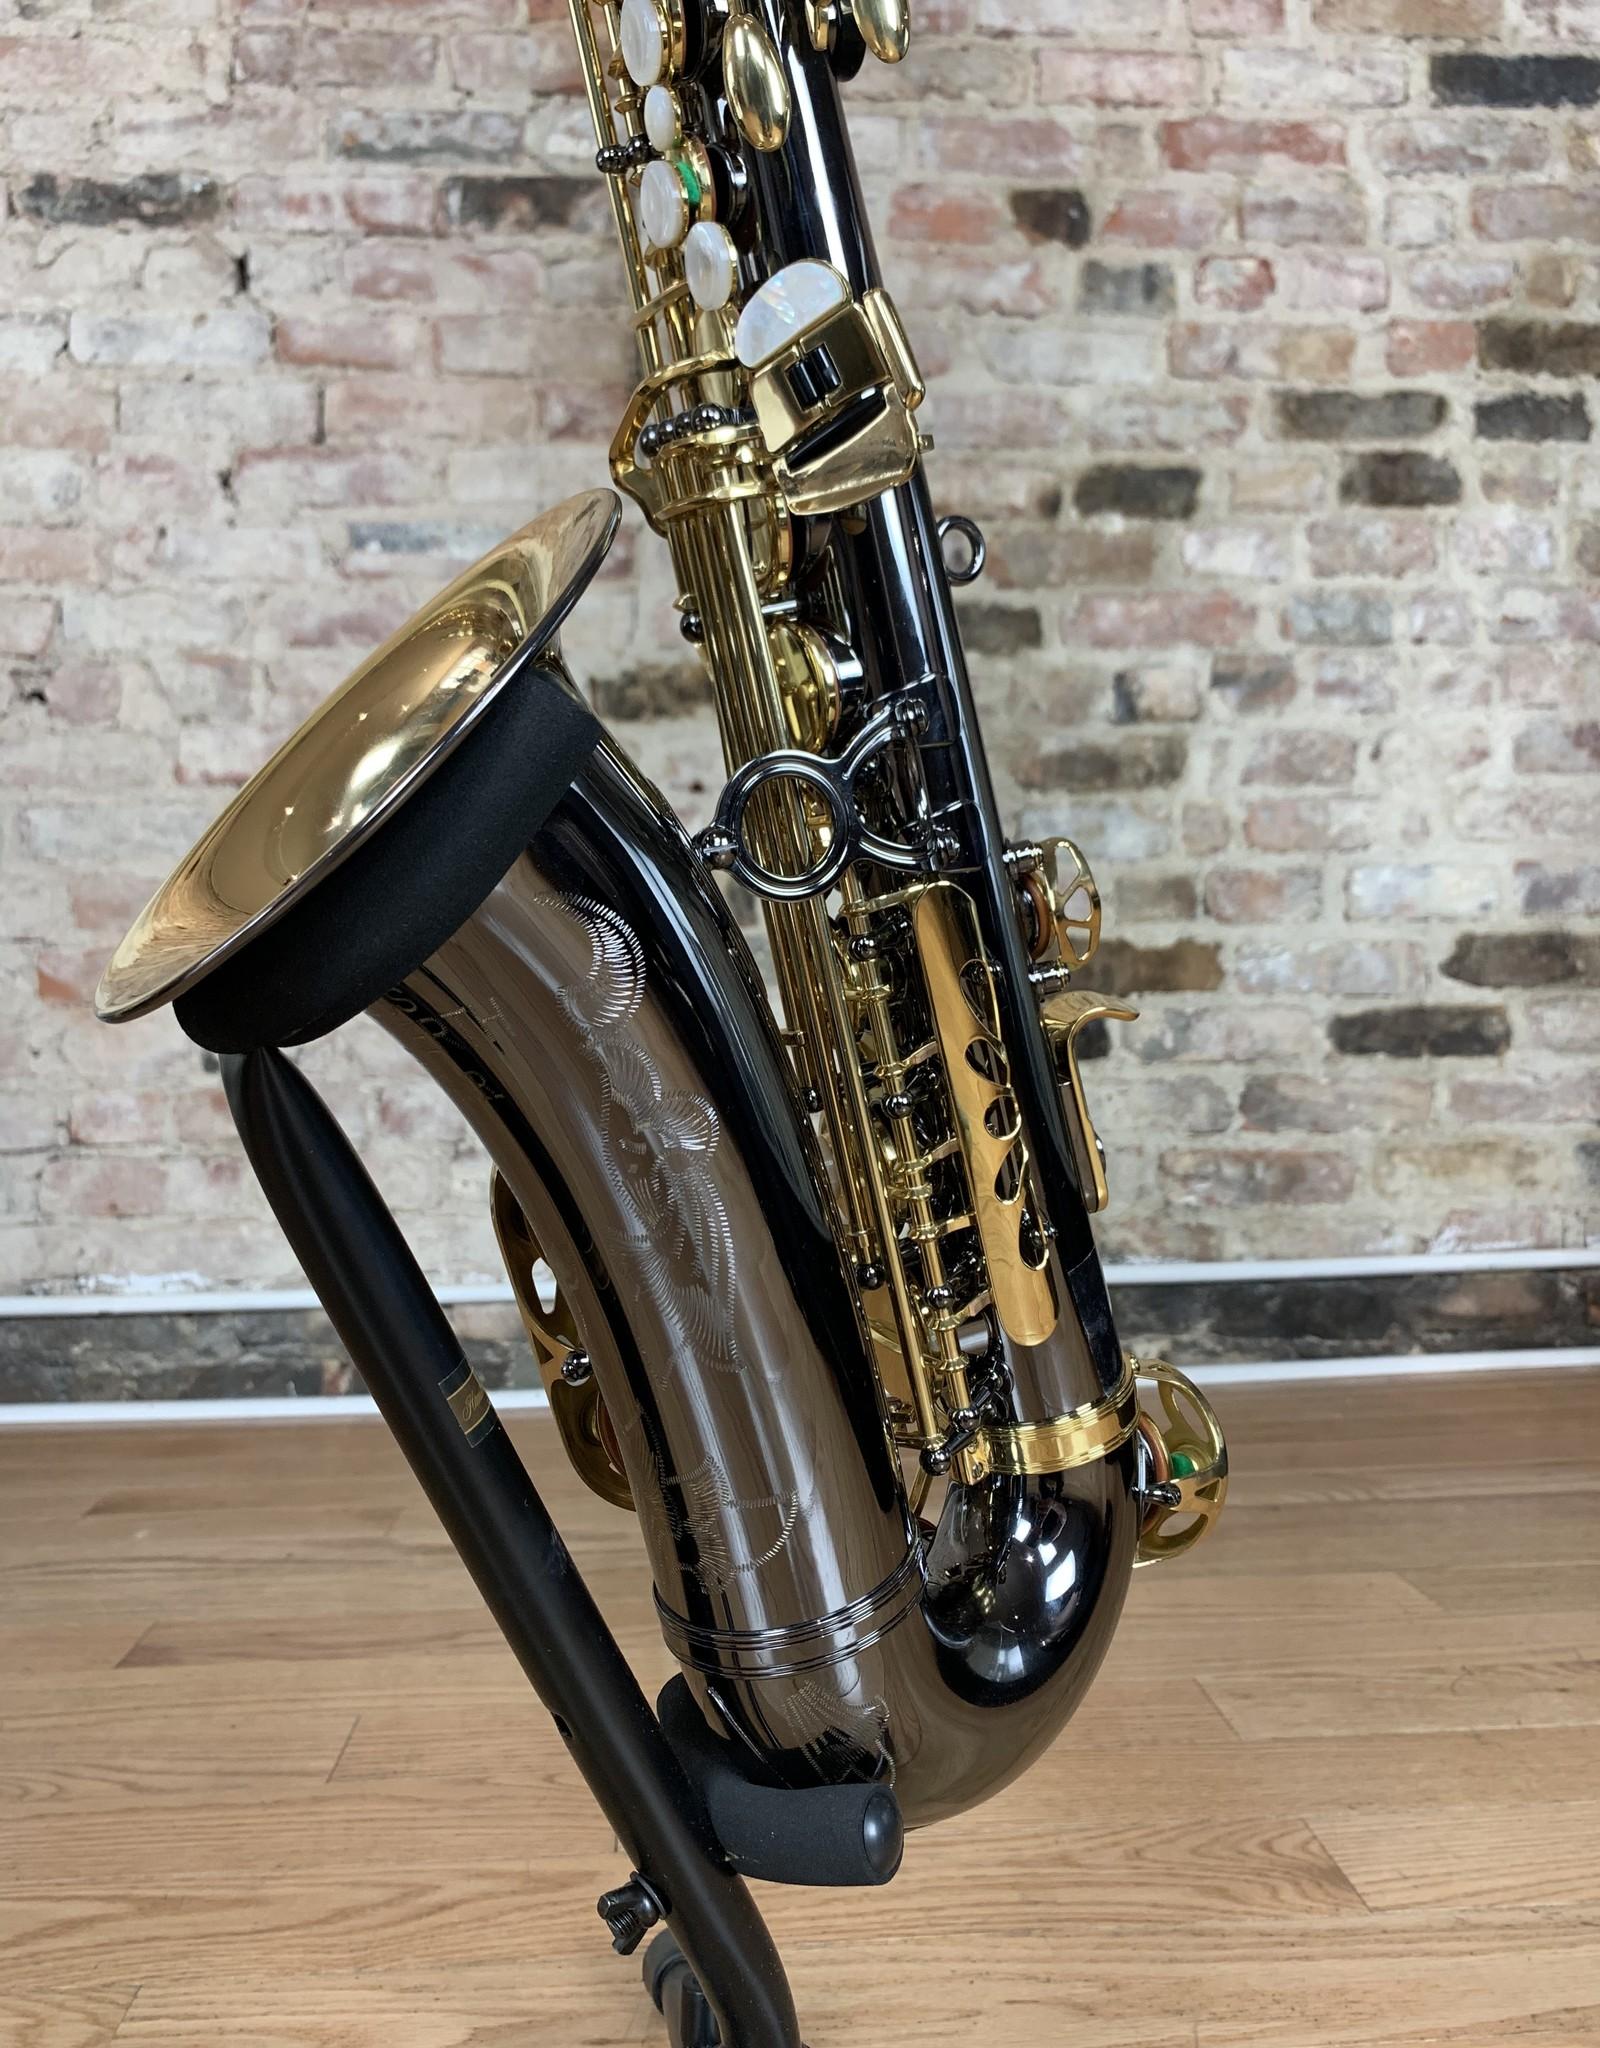 Keilwerth Julius Keilwerth SX90 Alto Saxophone Black Nickel Plated